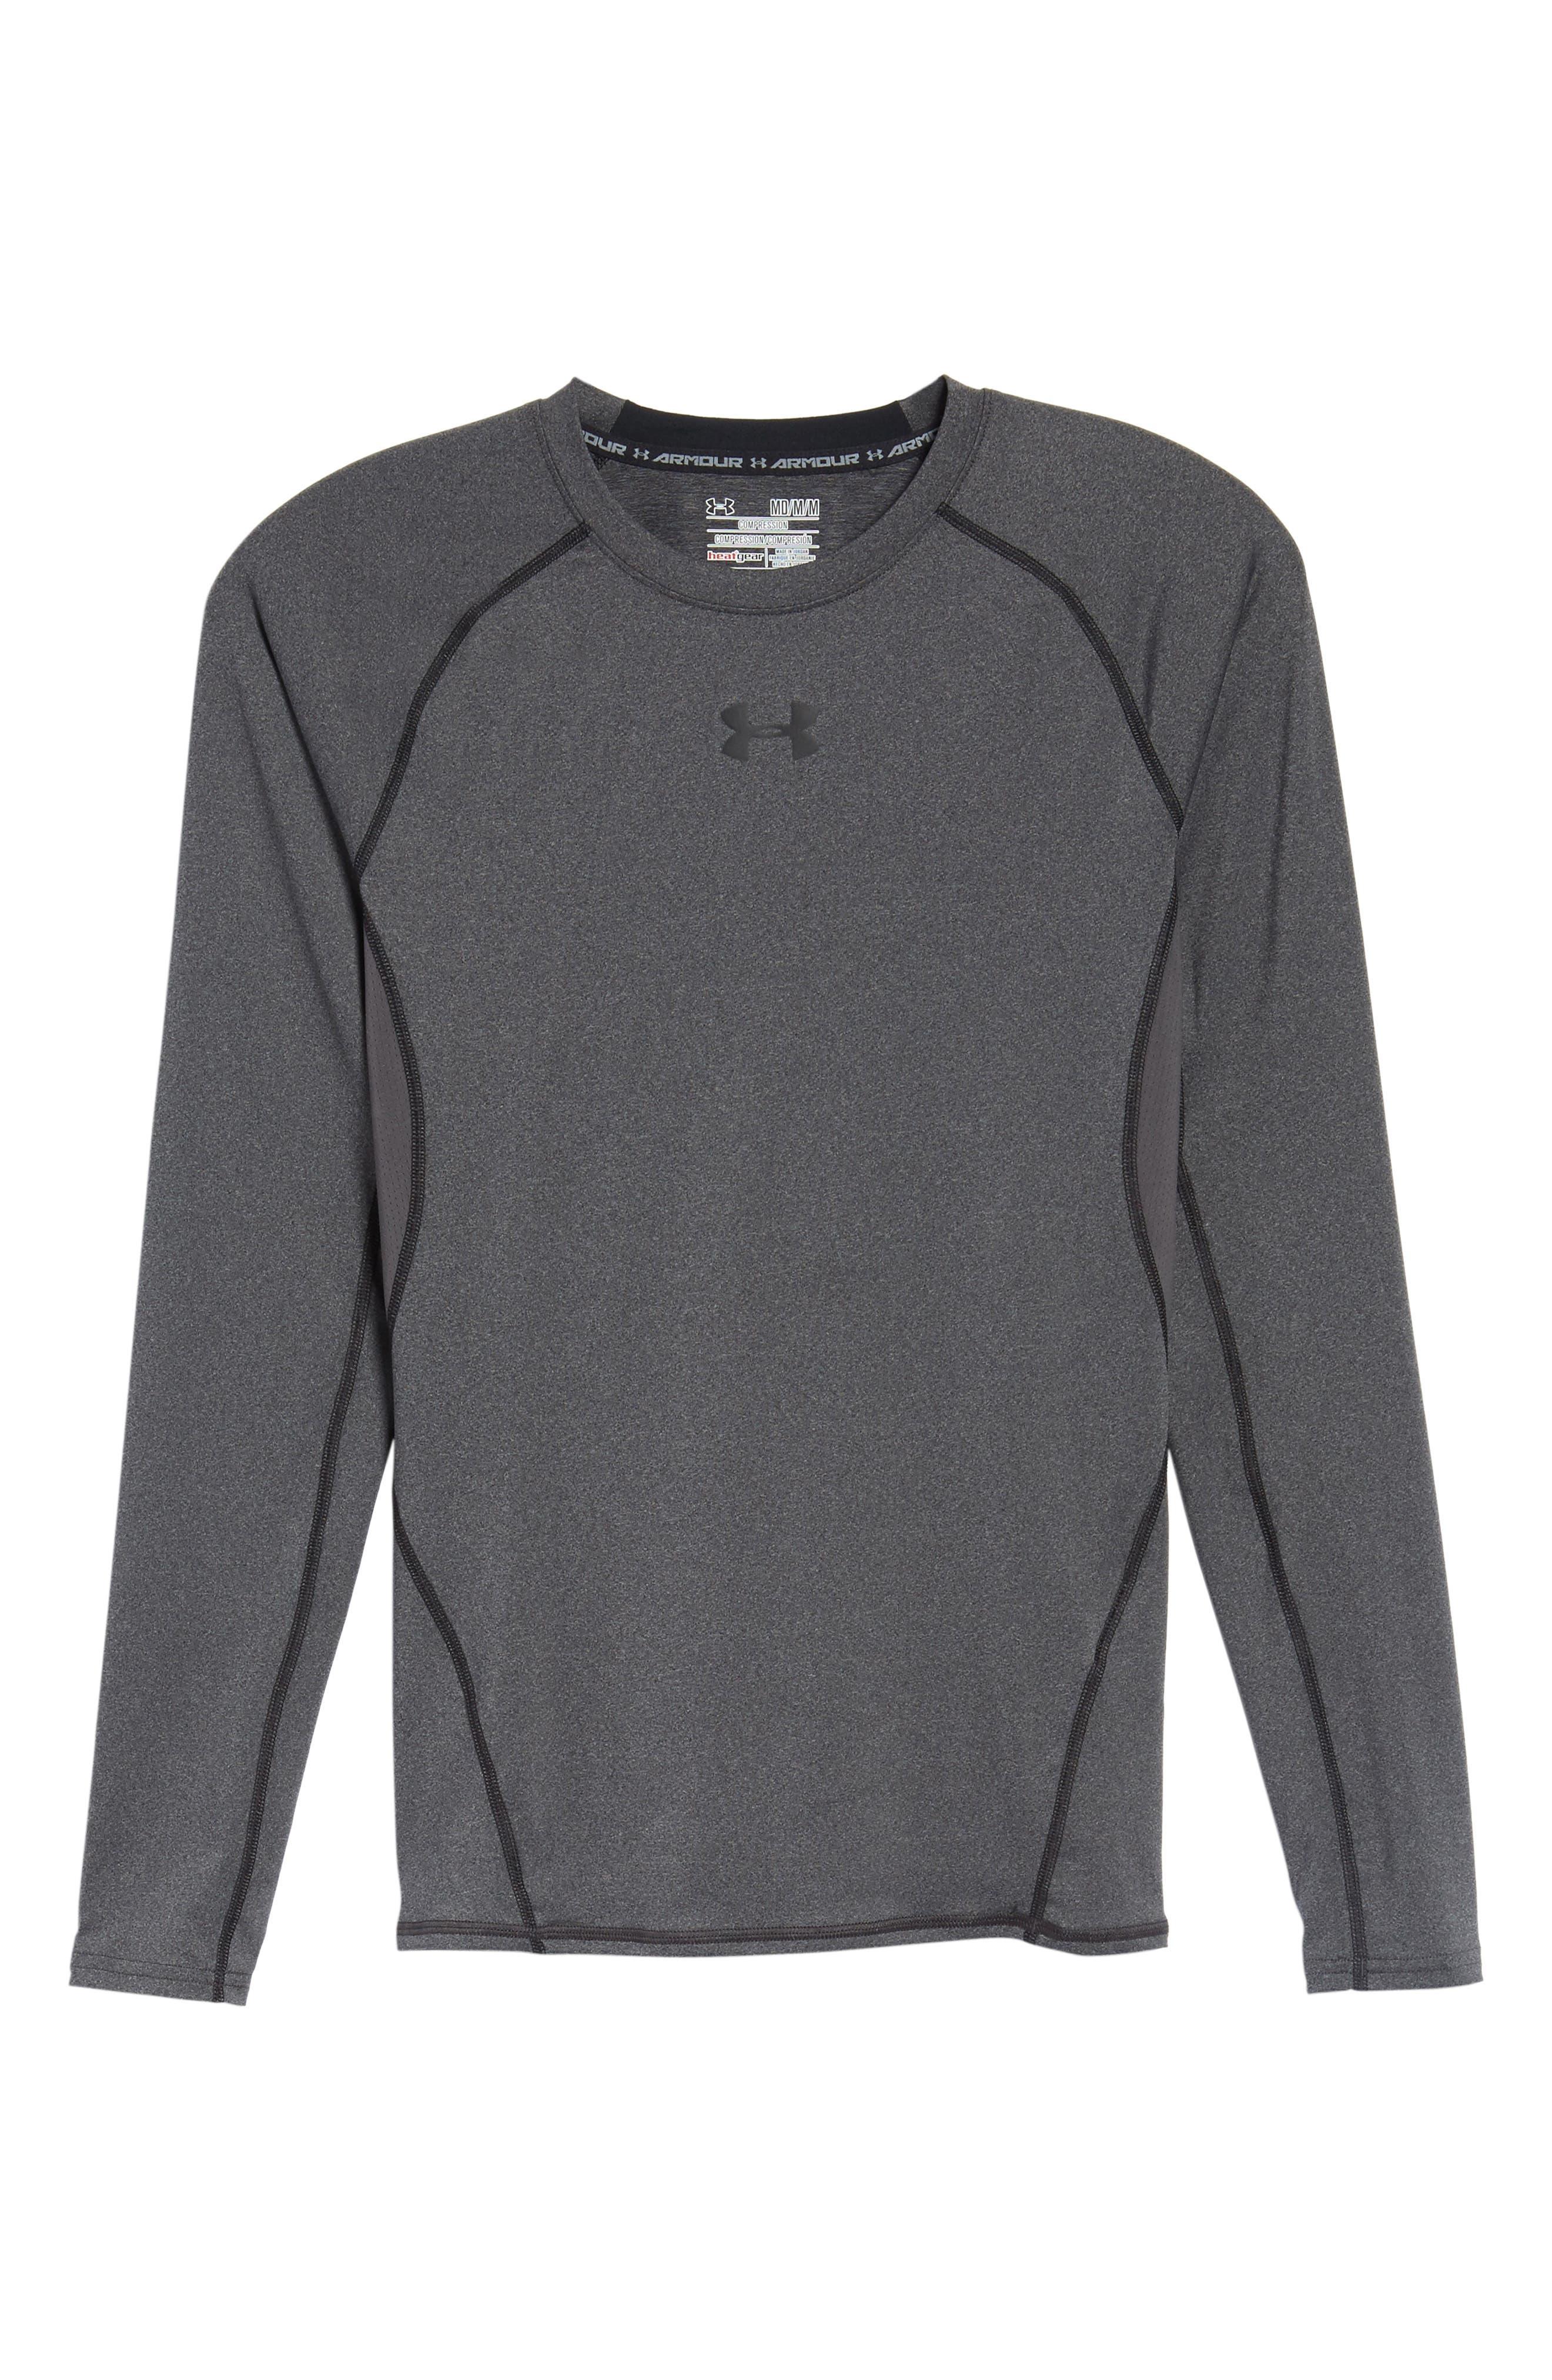 HeatGear<sup>®</sup> Compression Fit Long Sleeve T-Shirt,                             Alternate thumbnail 6, color,                             CARBON HEATHER/ BLACK